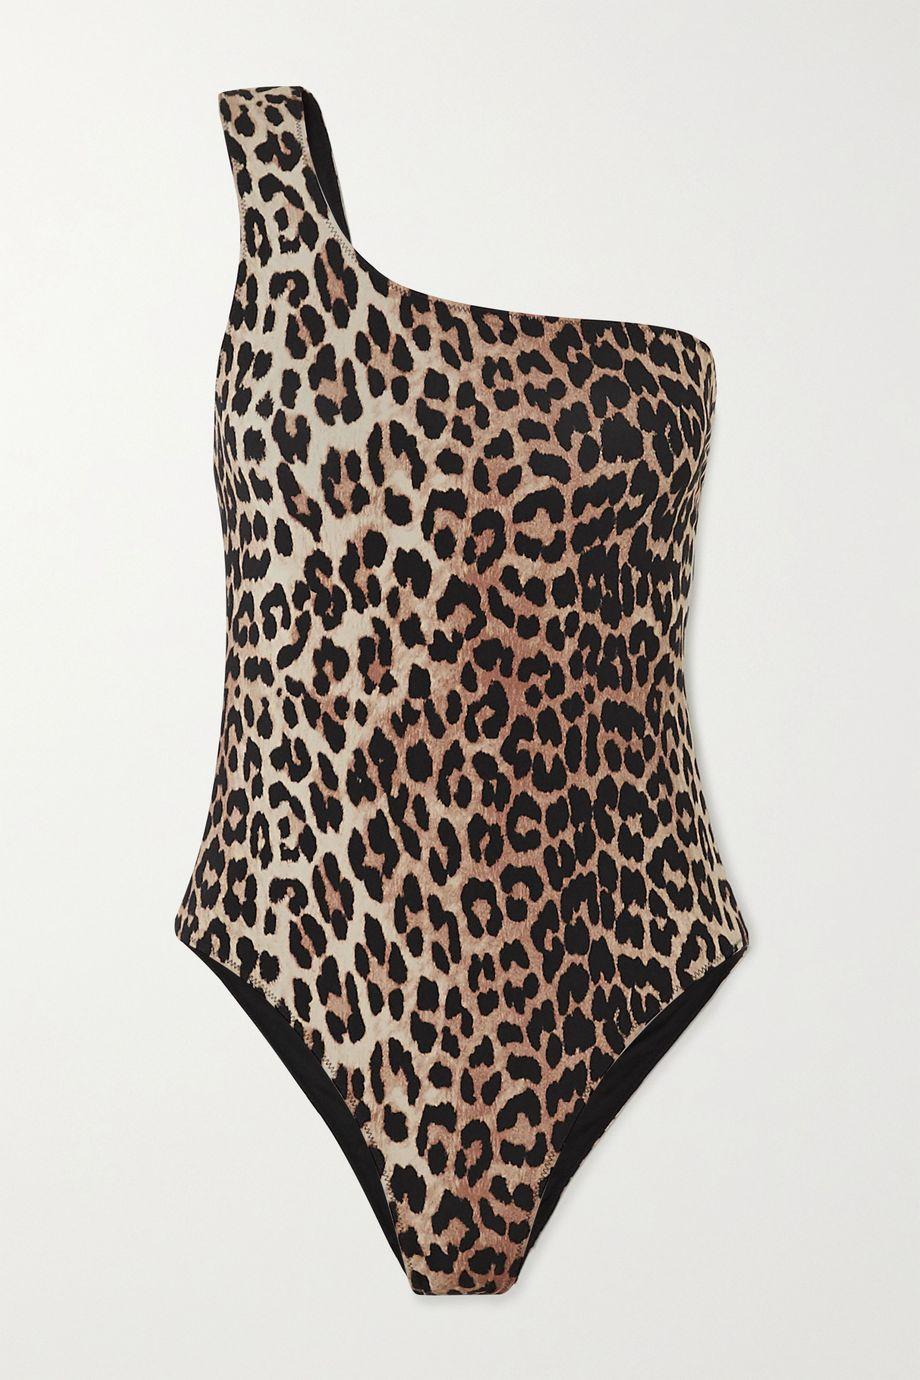 GANNI One-shoulder leopard-print swimsuit